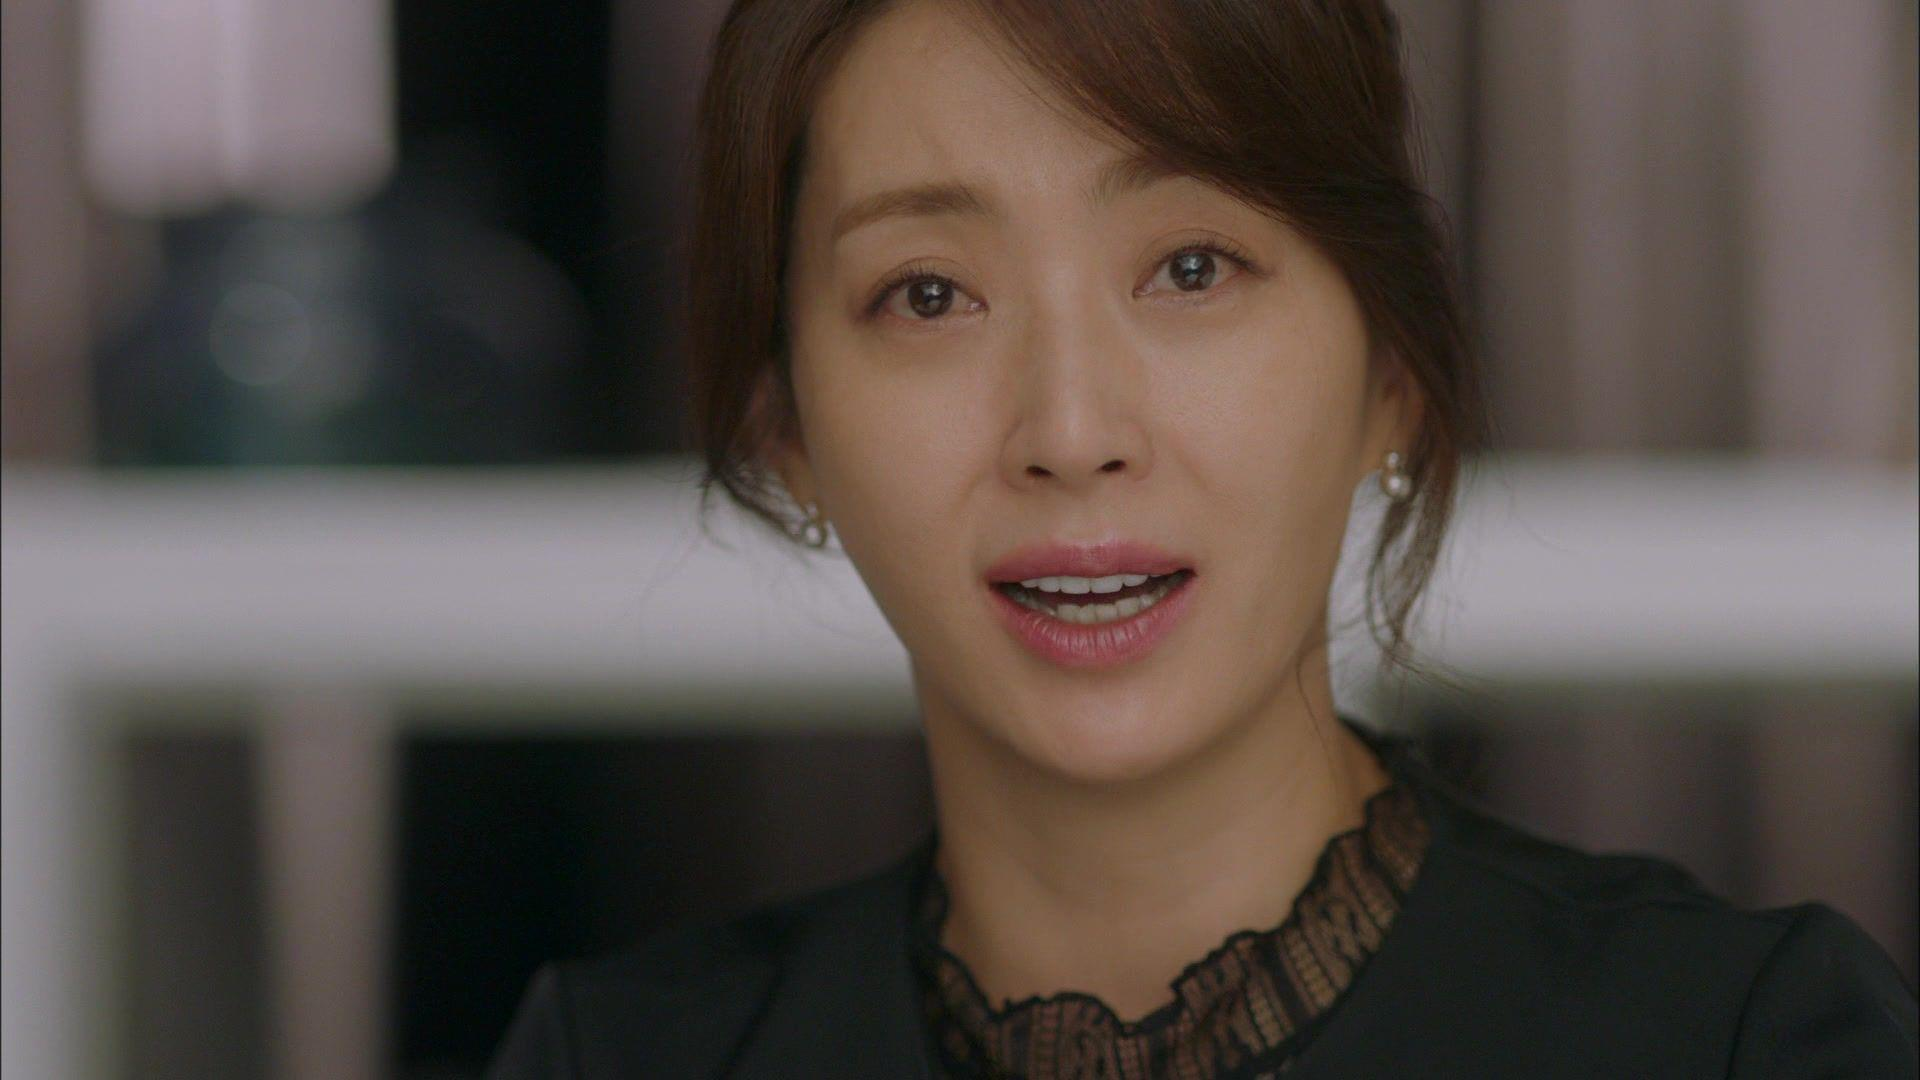 The K2 Episode 4 - THE K2 - Watch Full Episodes Free - Korea - TV